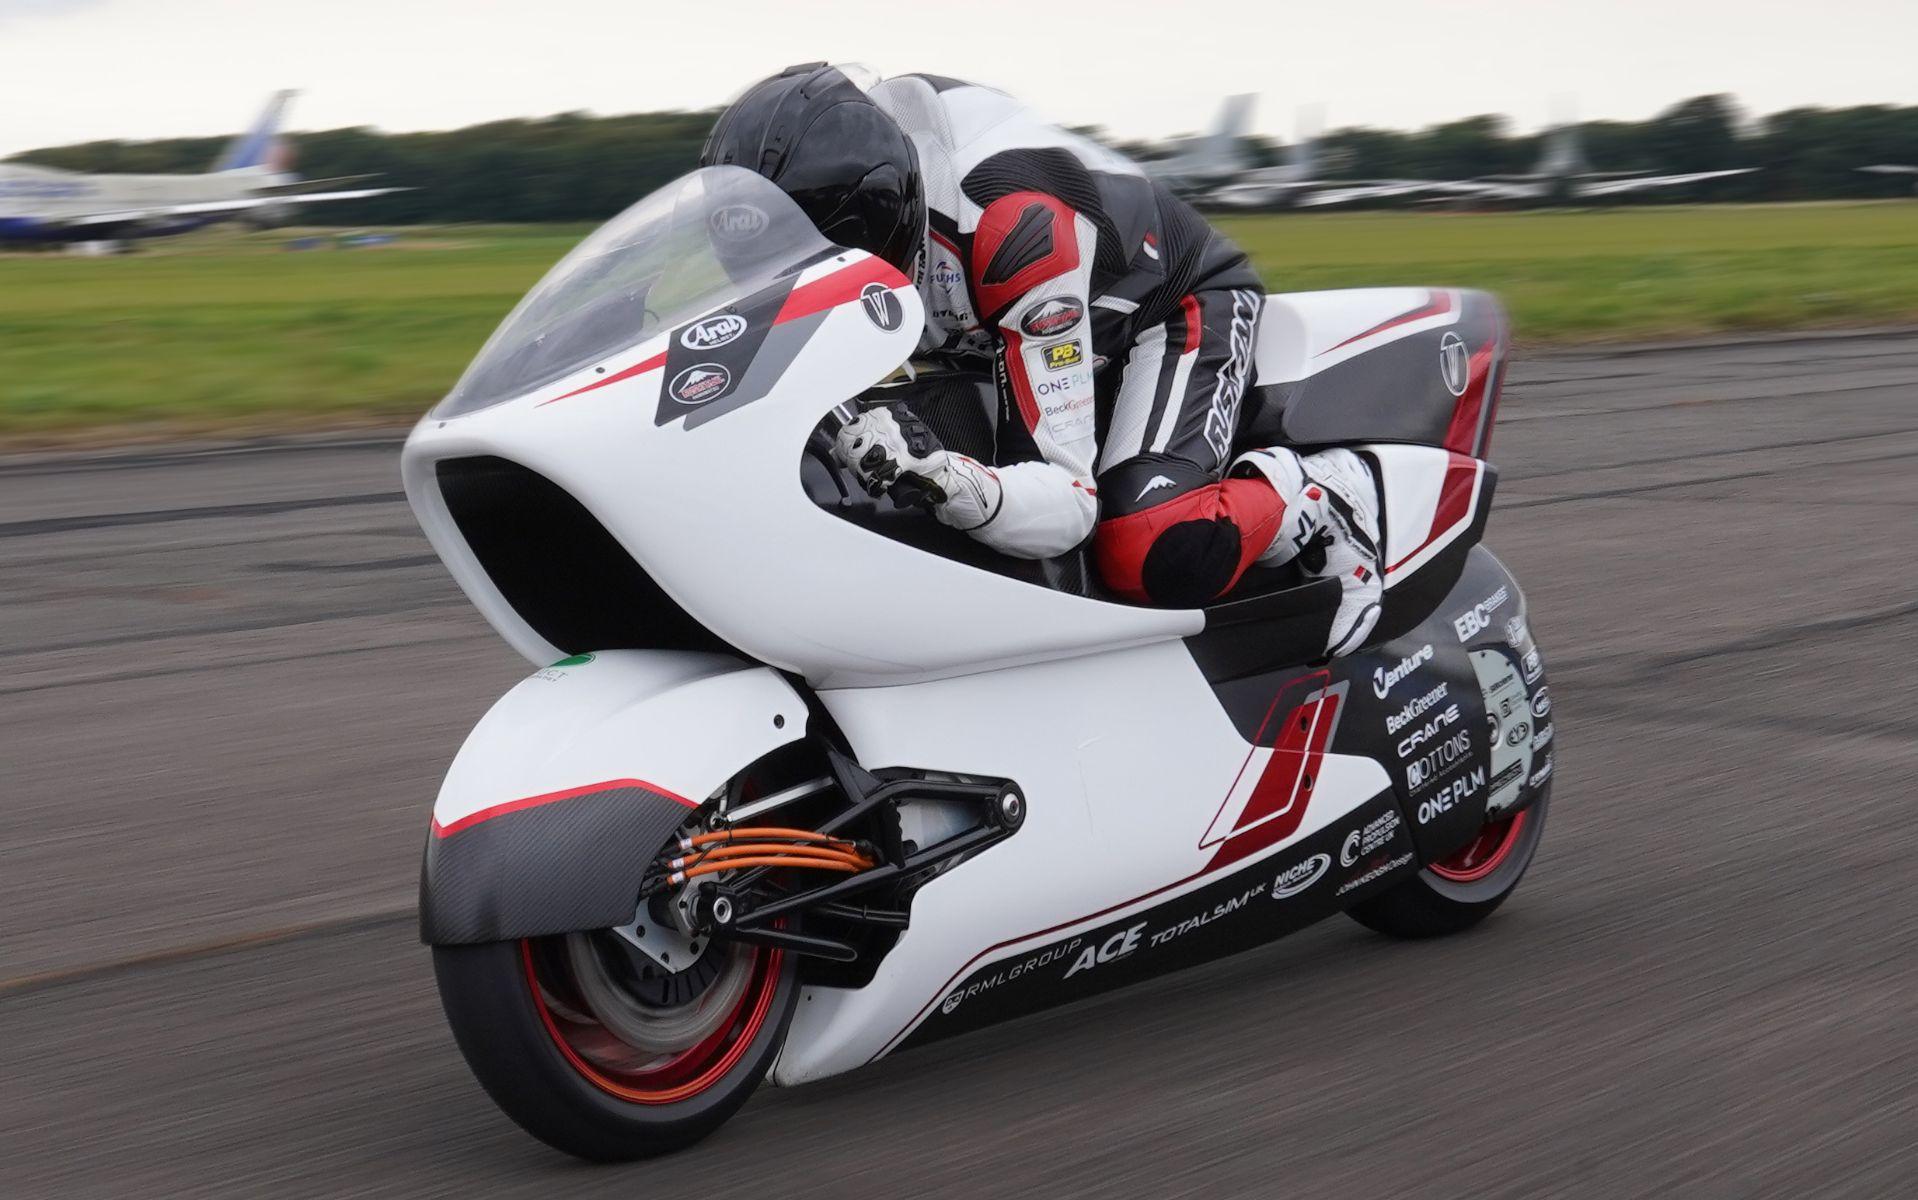 white motorcycle concepts wmc250ev em teste pista frente